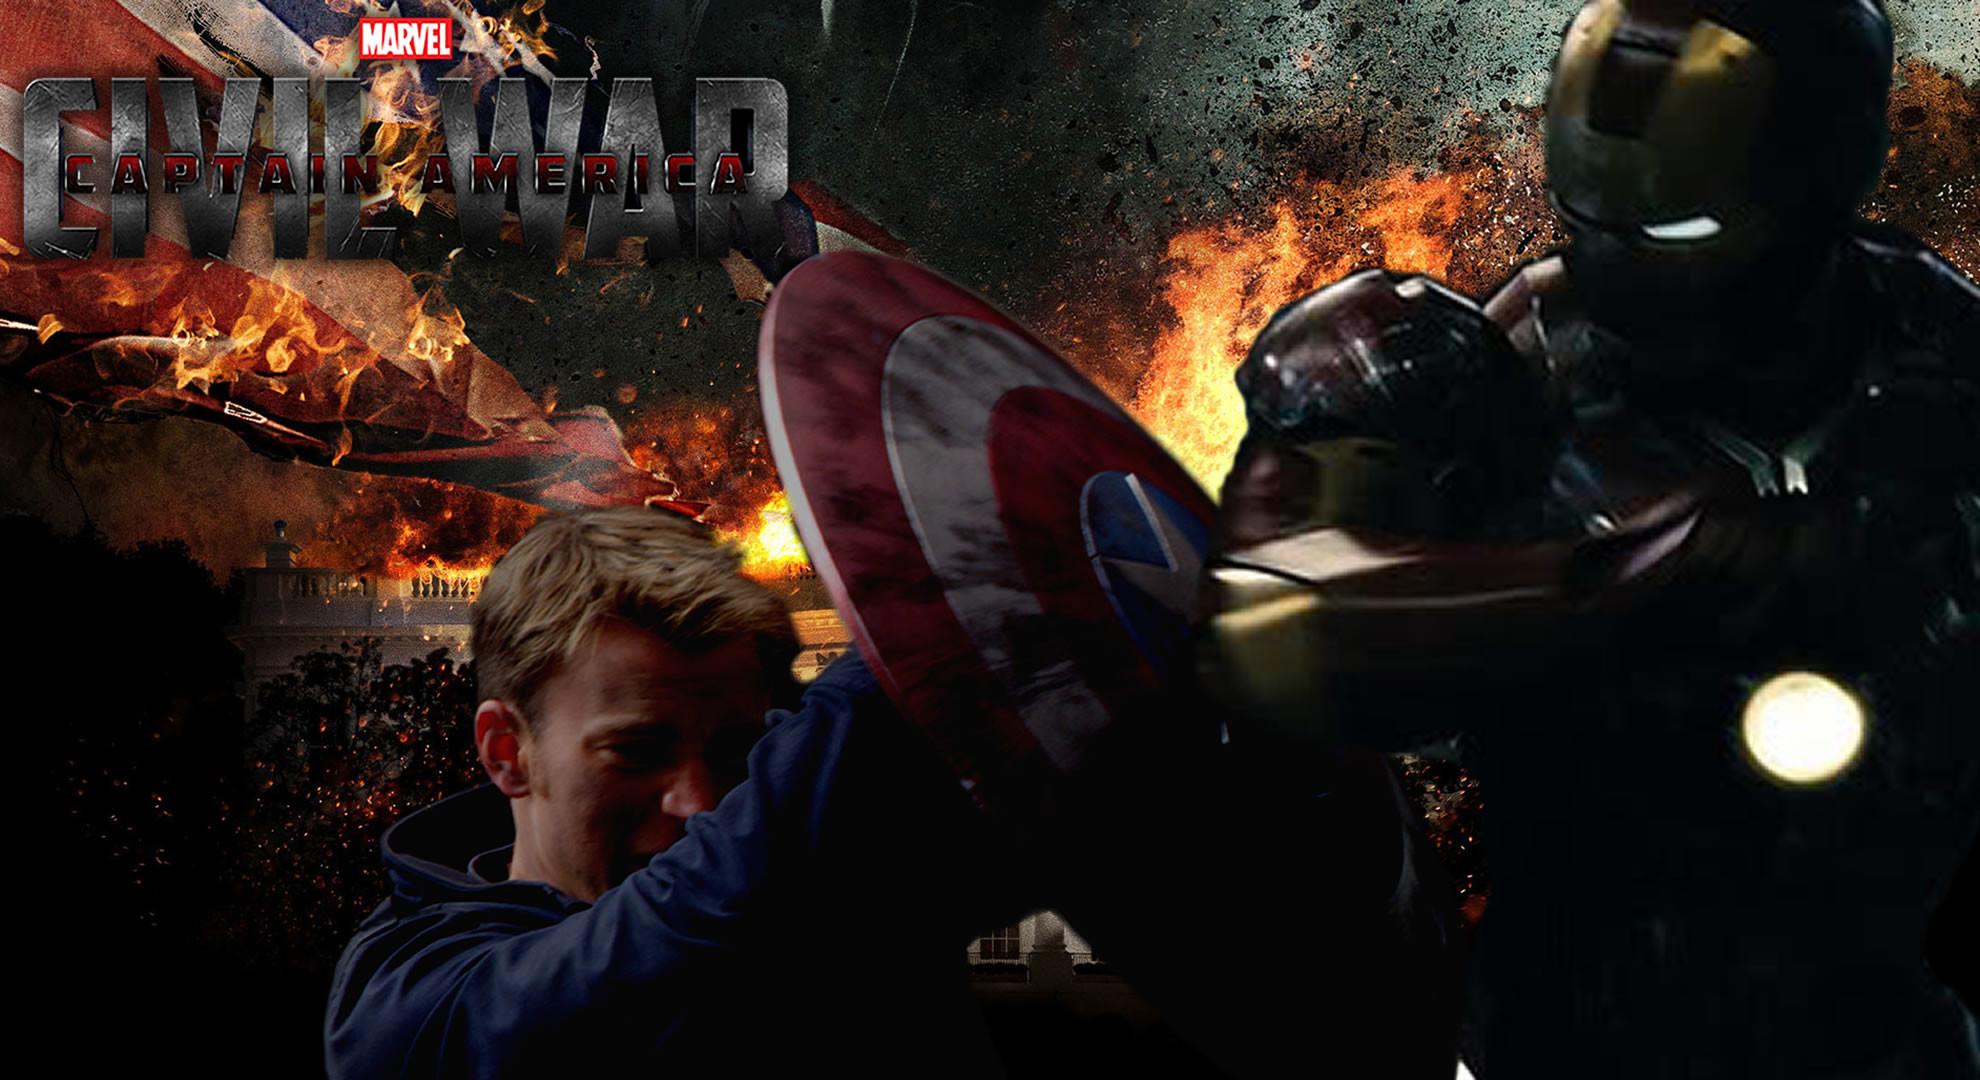 Civil war marvel hd wallpaper 70 images - Avengers civil war wallpaper ...